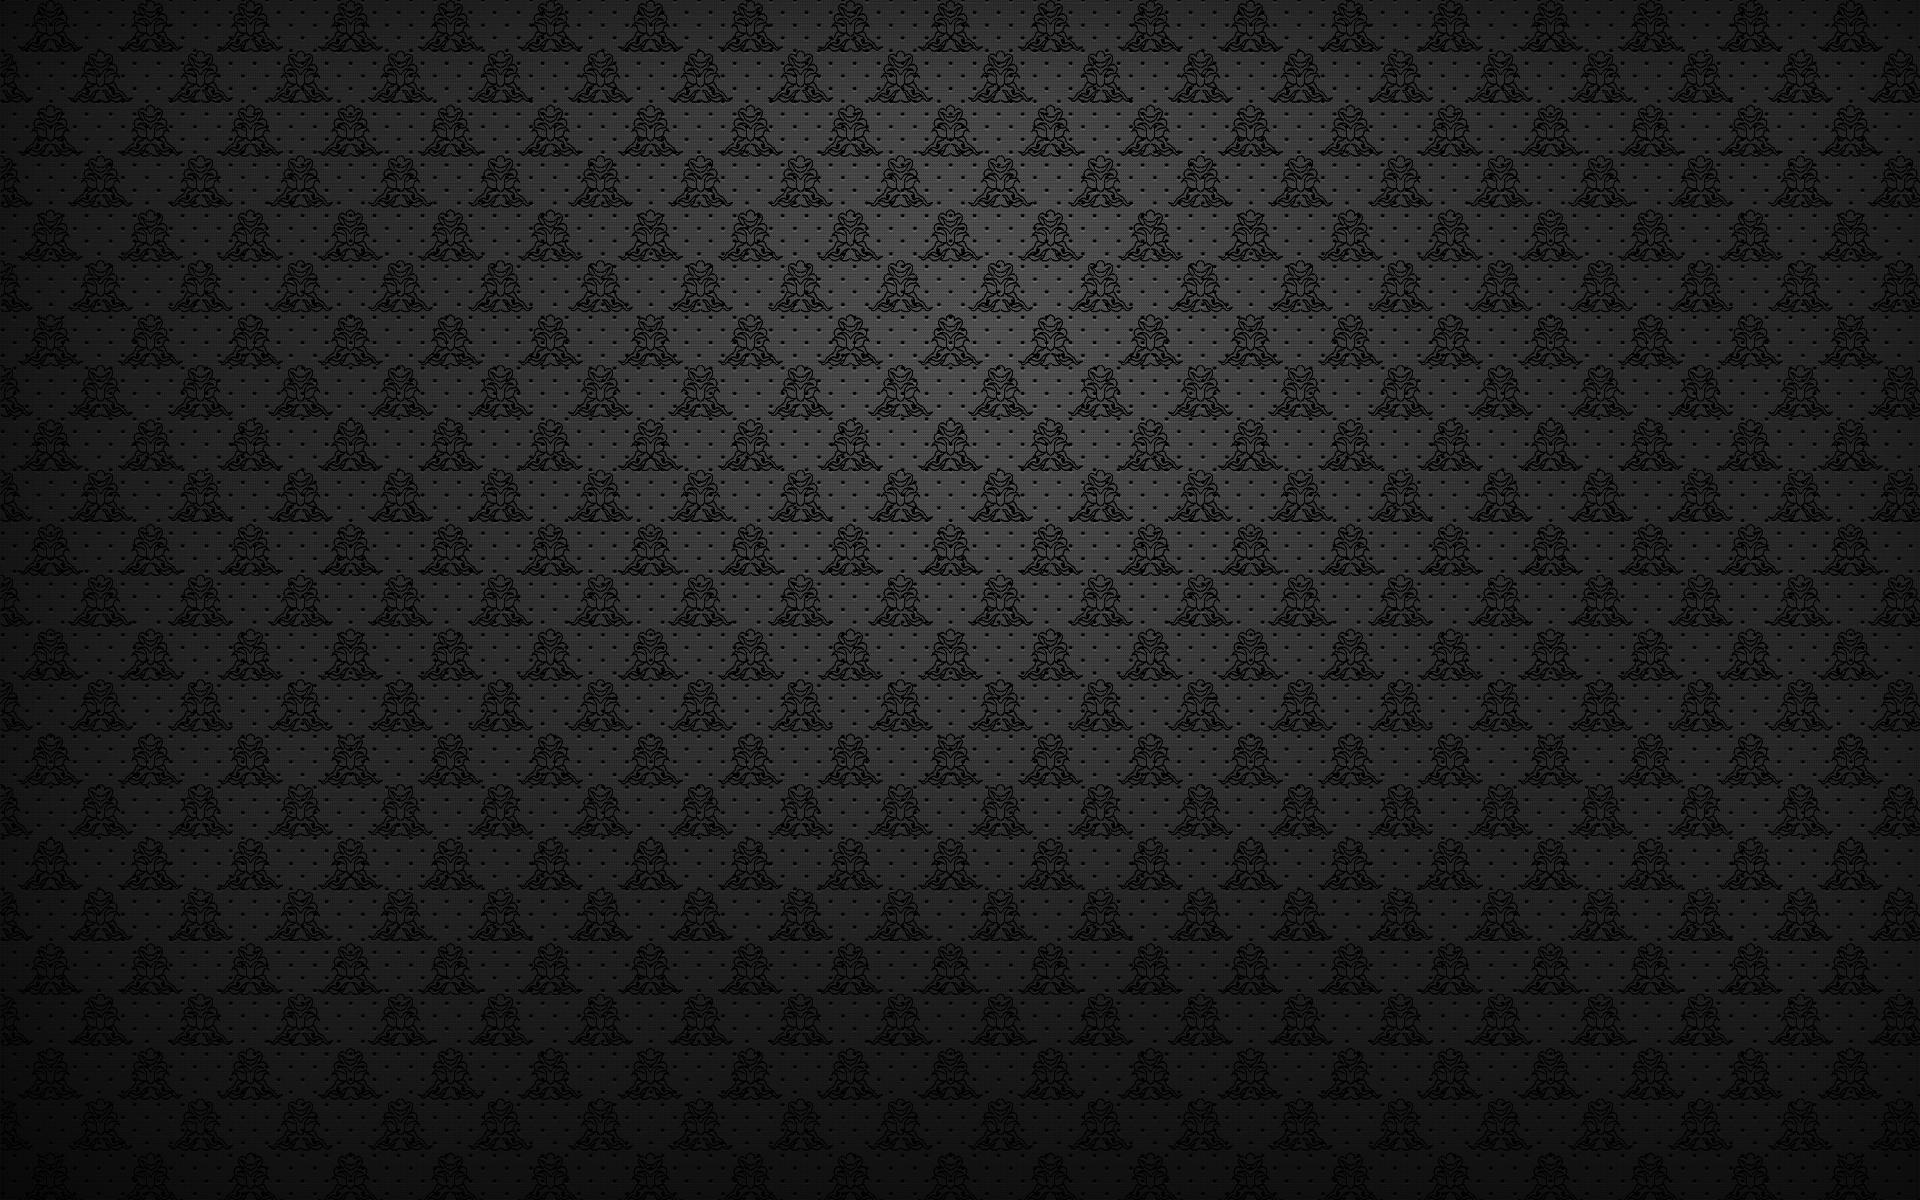 ... Black Elegant Wallpaper ...